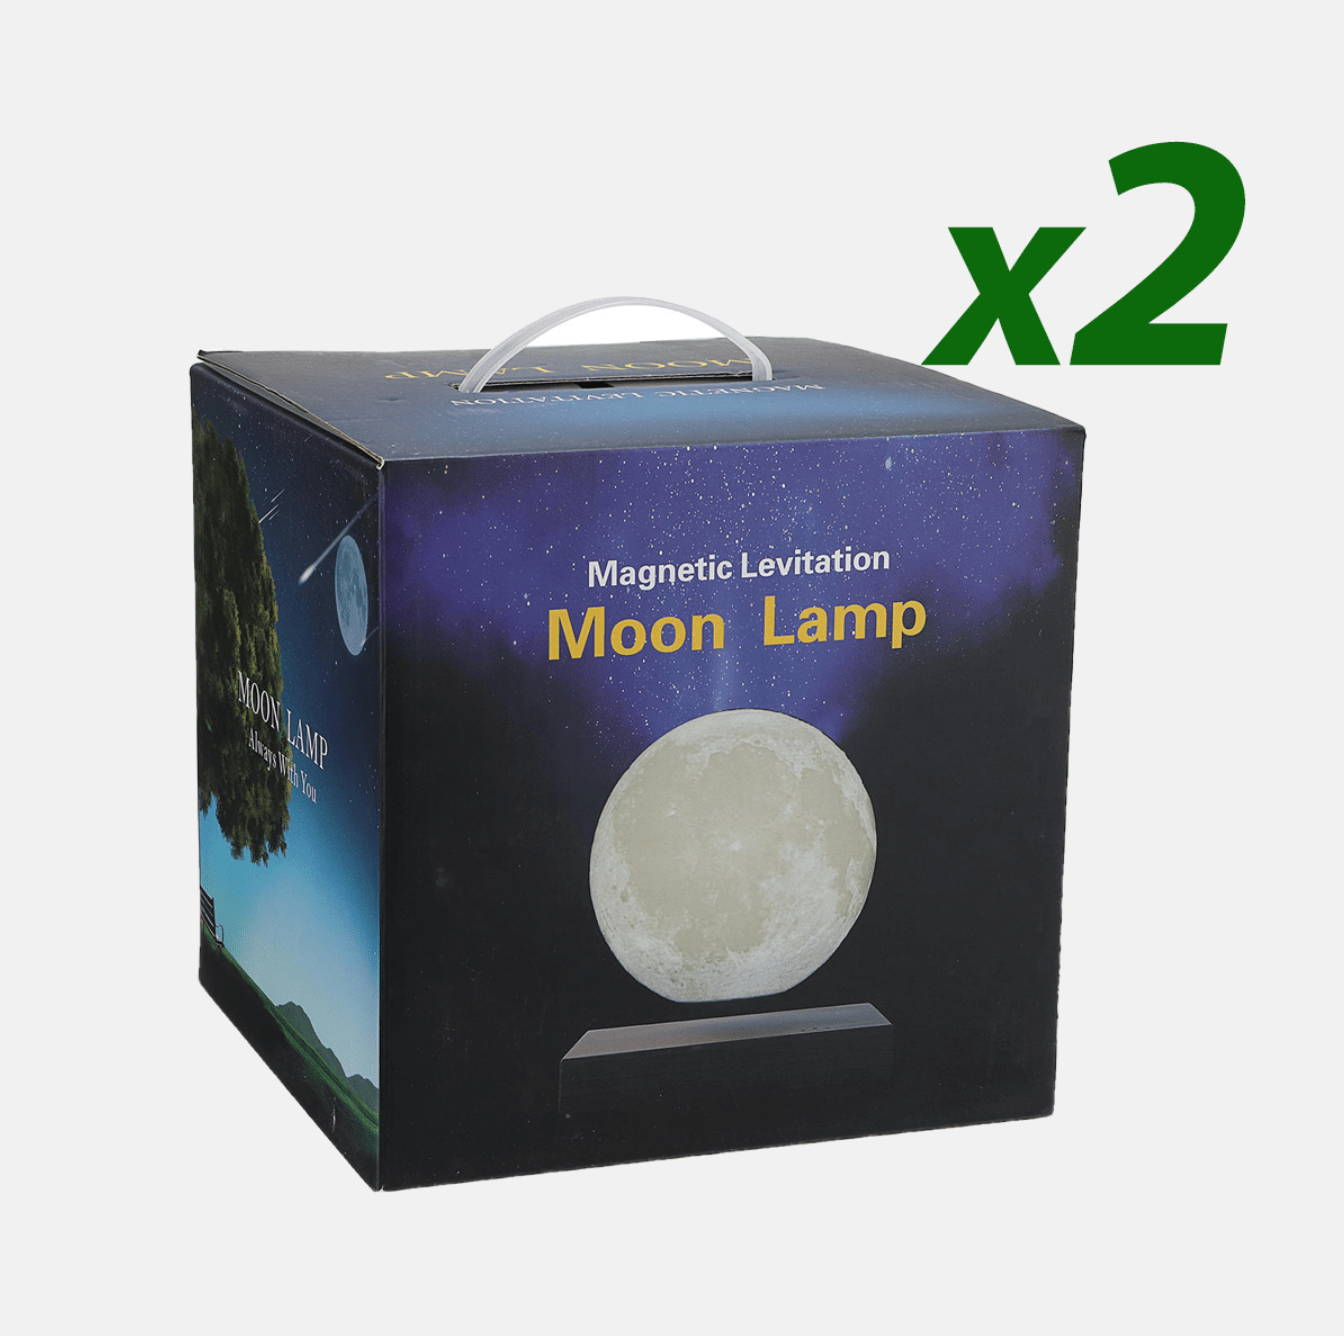 Best Quality Levitating Moon Lamp, Best Floating Moon Lamp, Best Magnetic Moon Lamp, Amazing Moon Lamp